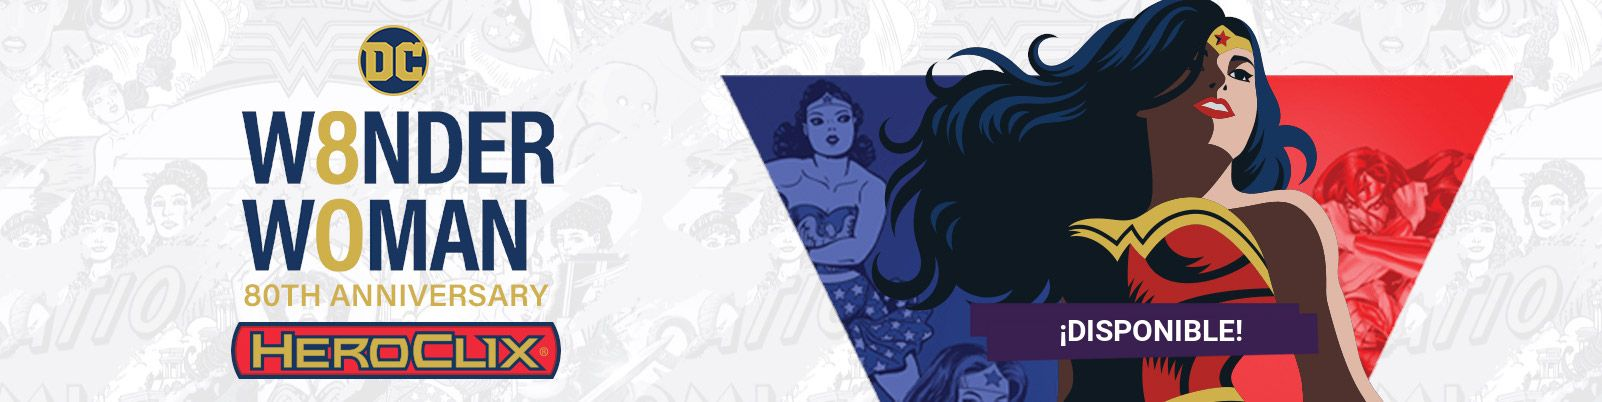 HeroClix DC Wonder Woman 80th Anniversary